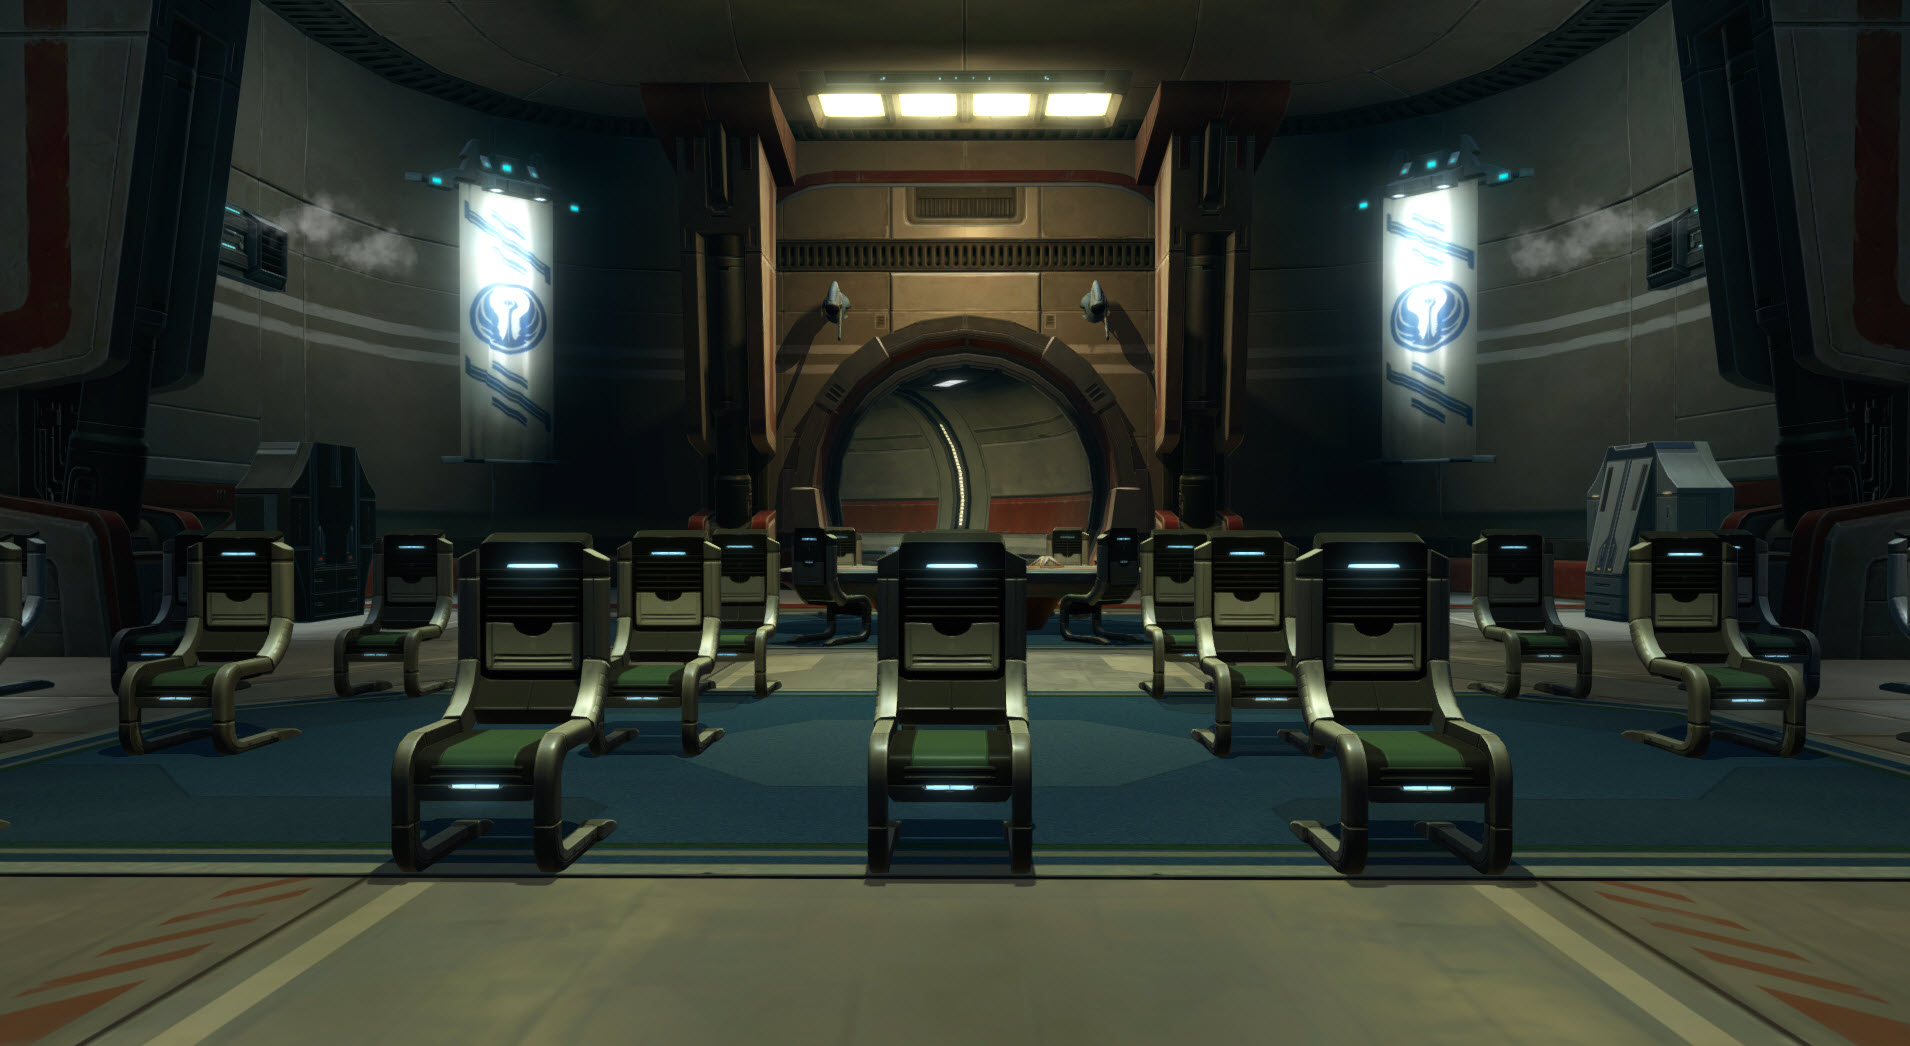 Aesthetic (Officer Deck – Briefing Room) – The Harbinger